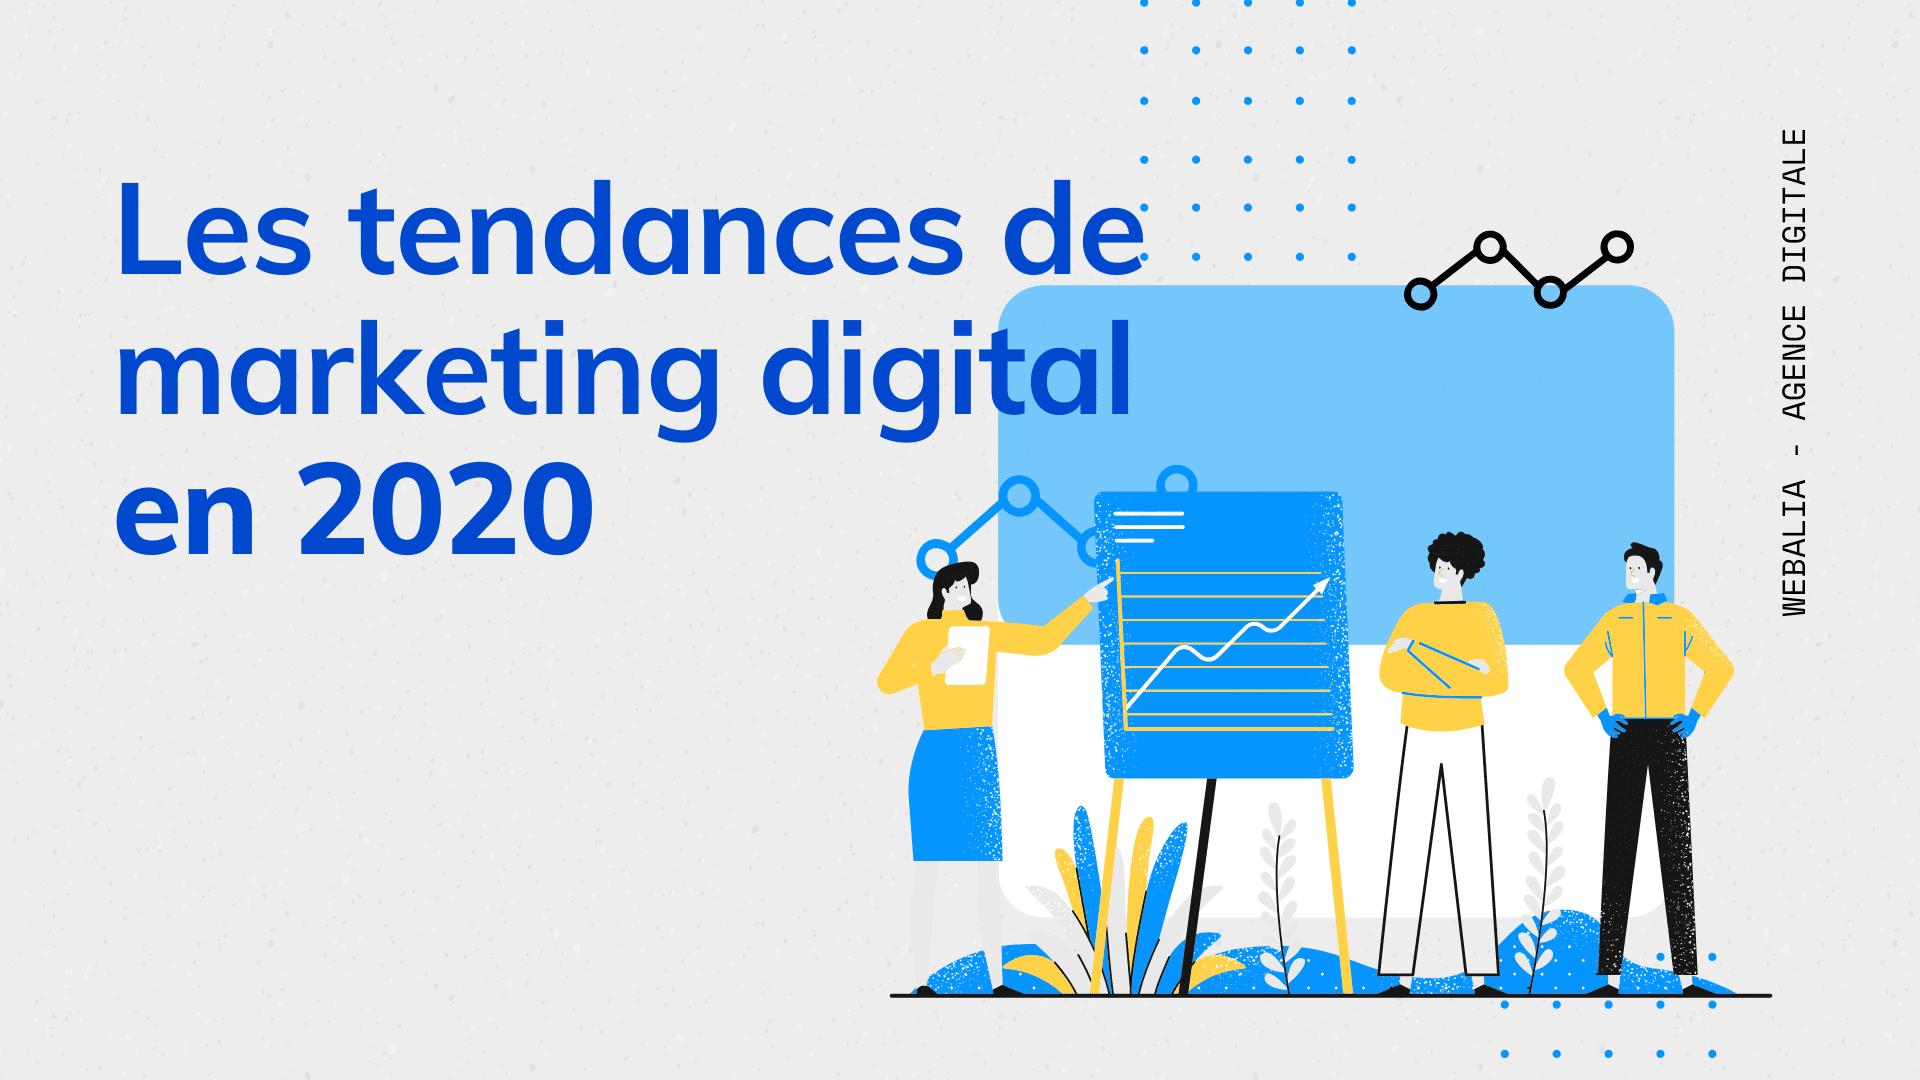 Les tendances de marketing digital en 2020